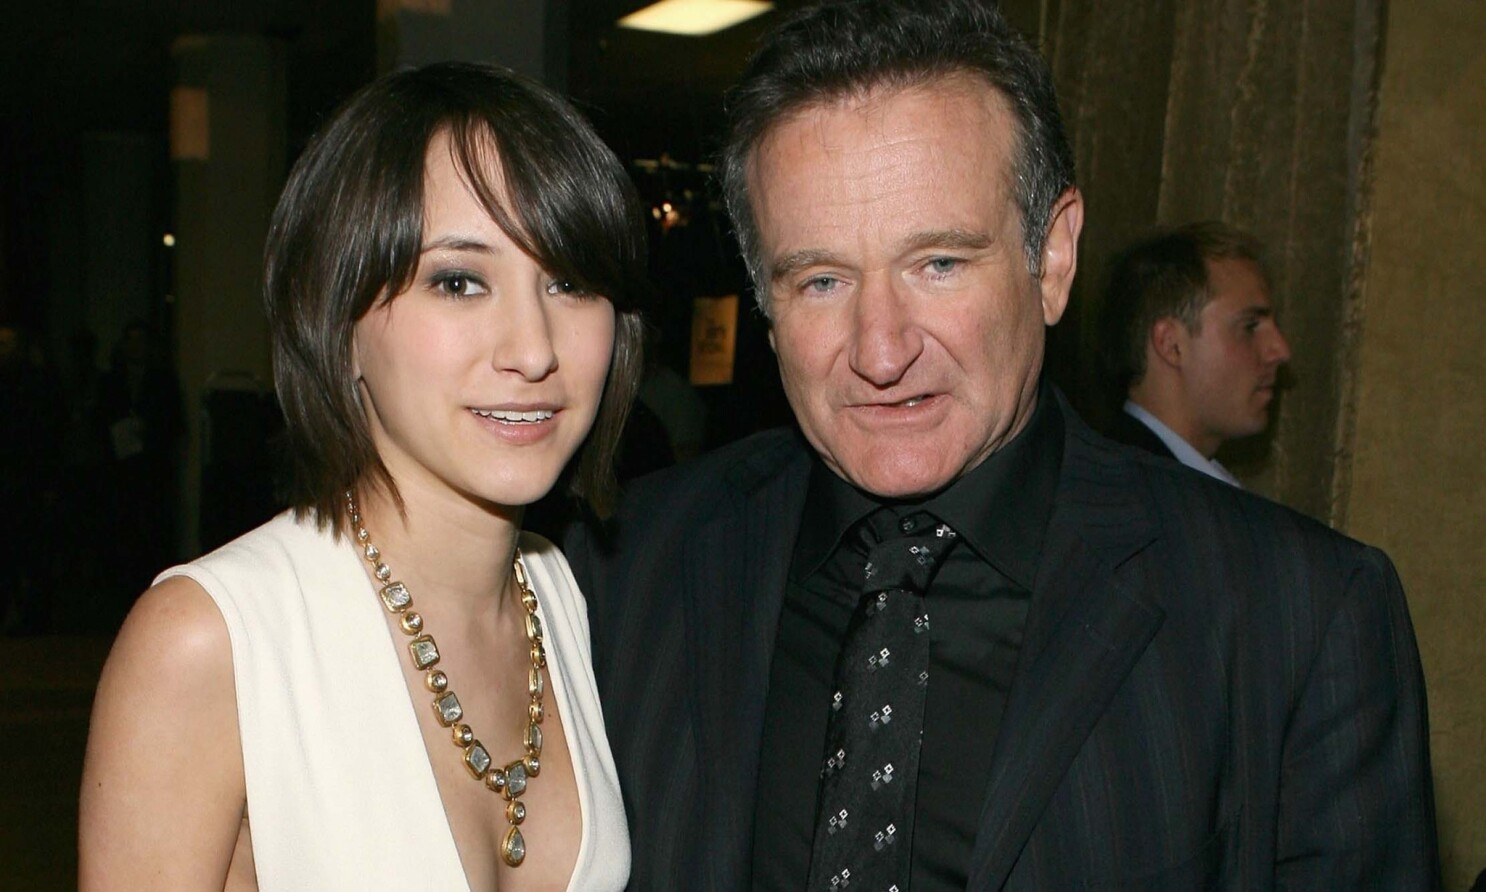 Robin Williams death Online bullies spark outrage, Twitter pledge ...